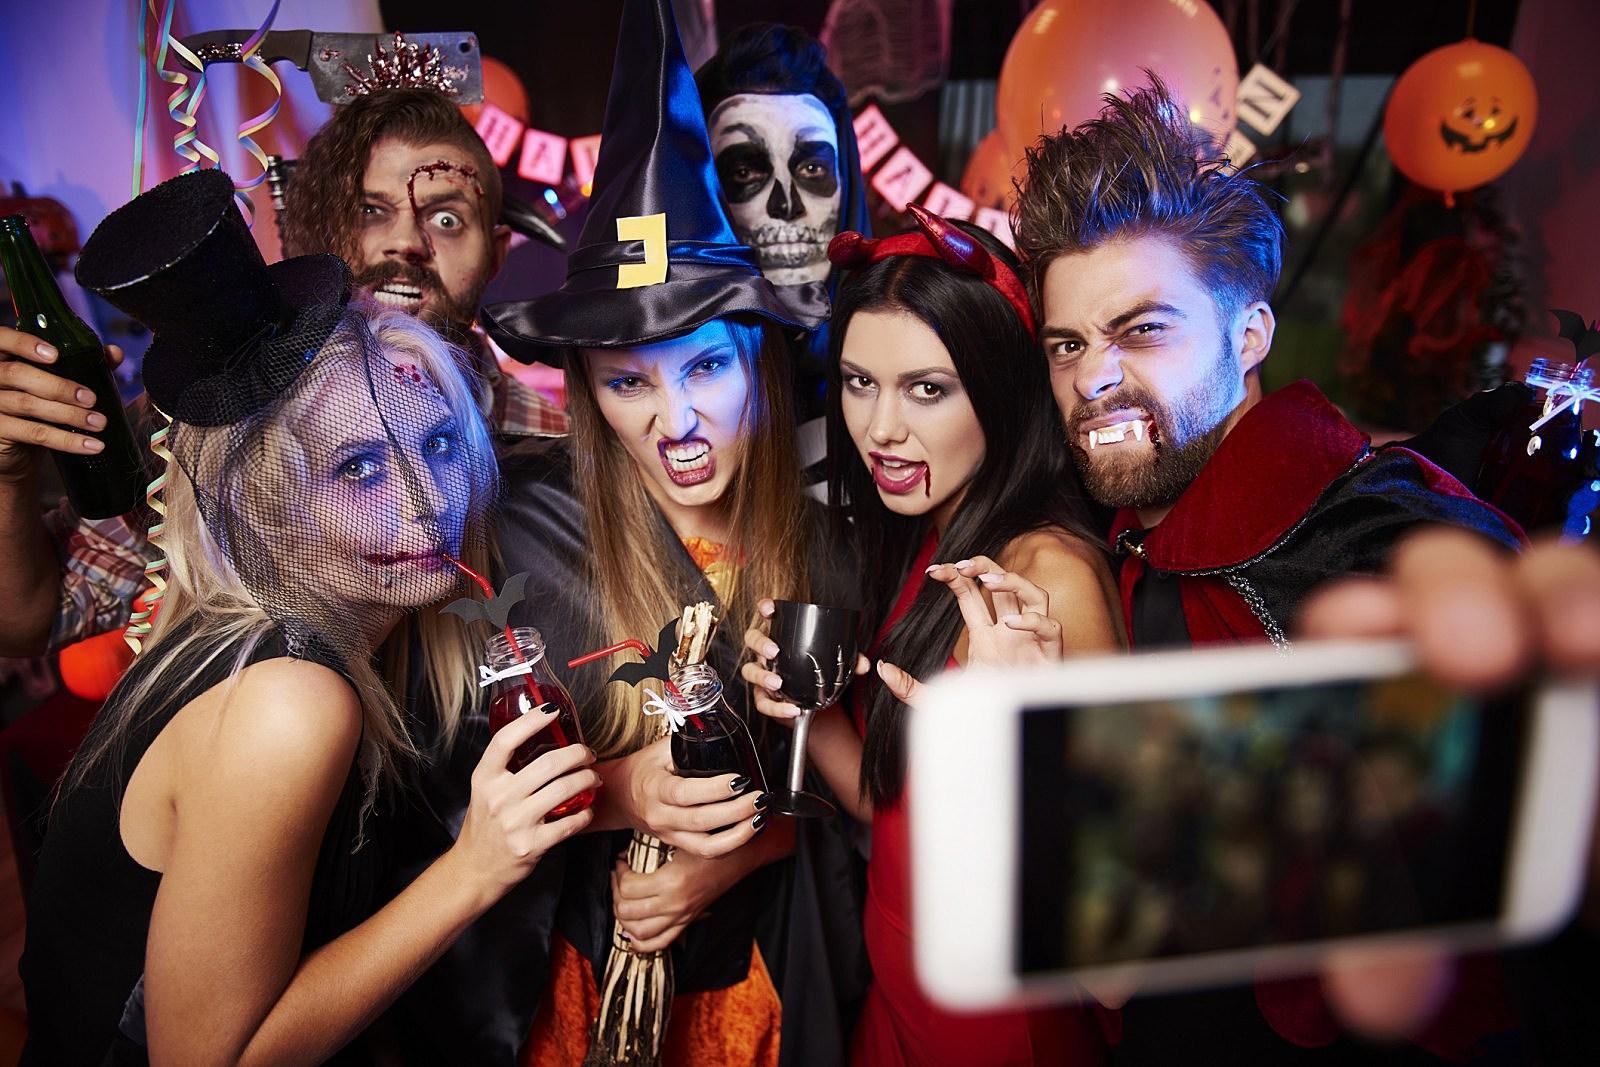 Mn halloween party sex pics